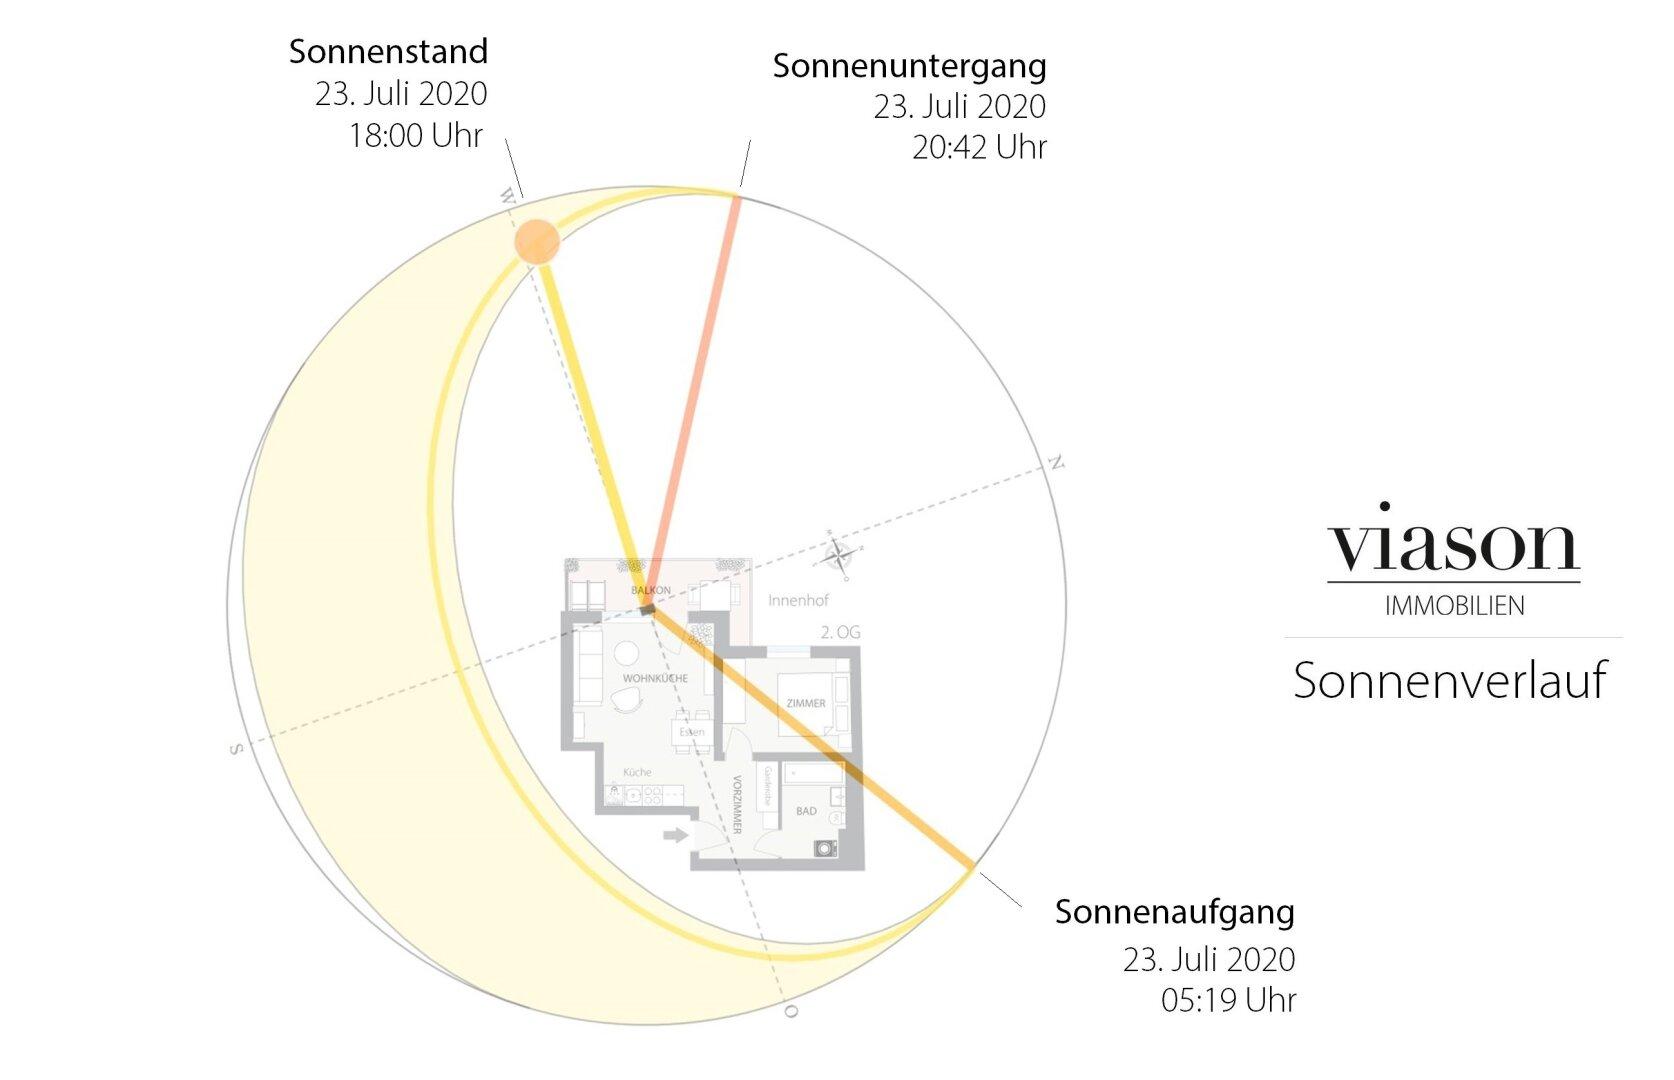 Sonnenverlauf viason immobilien